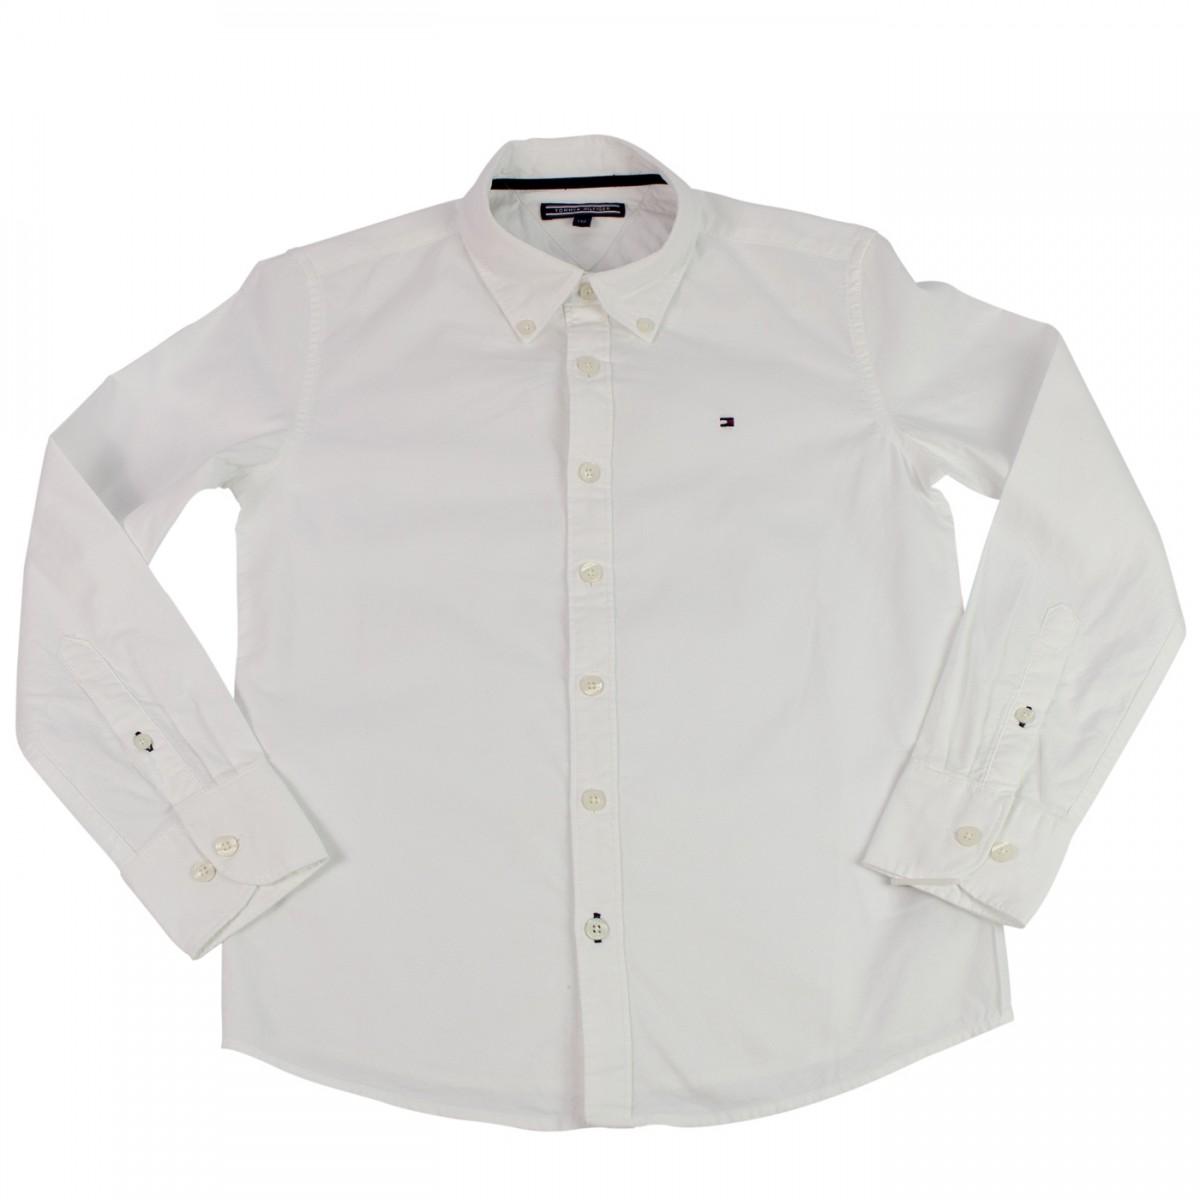 89910a6526 Bizz Store - Camisa Social Infantil Tommy Hilfiger Azul Branca